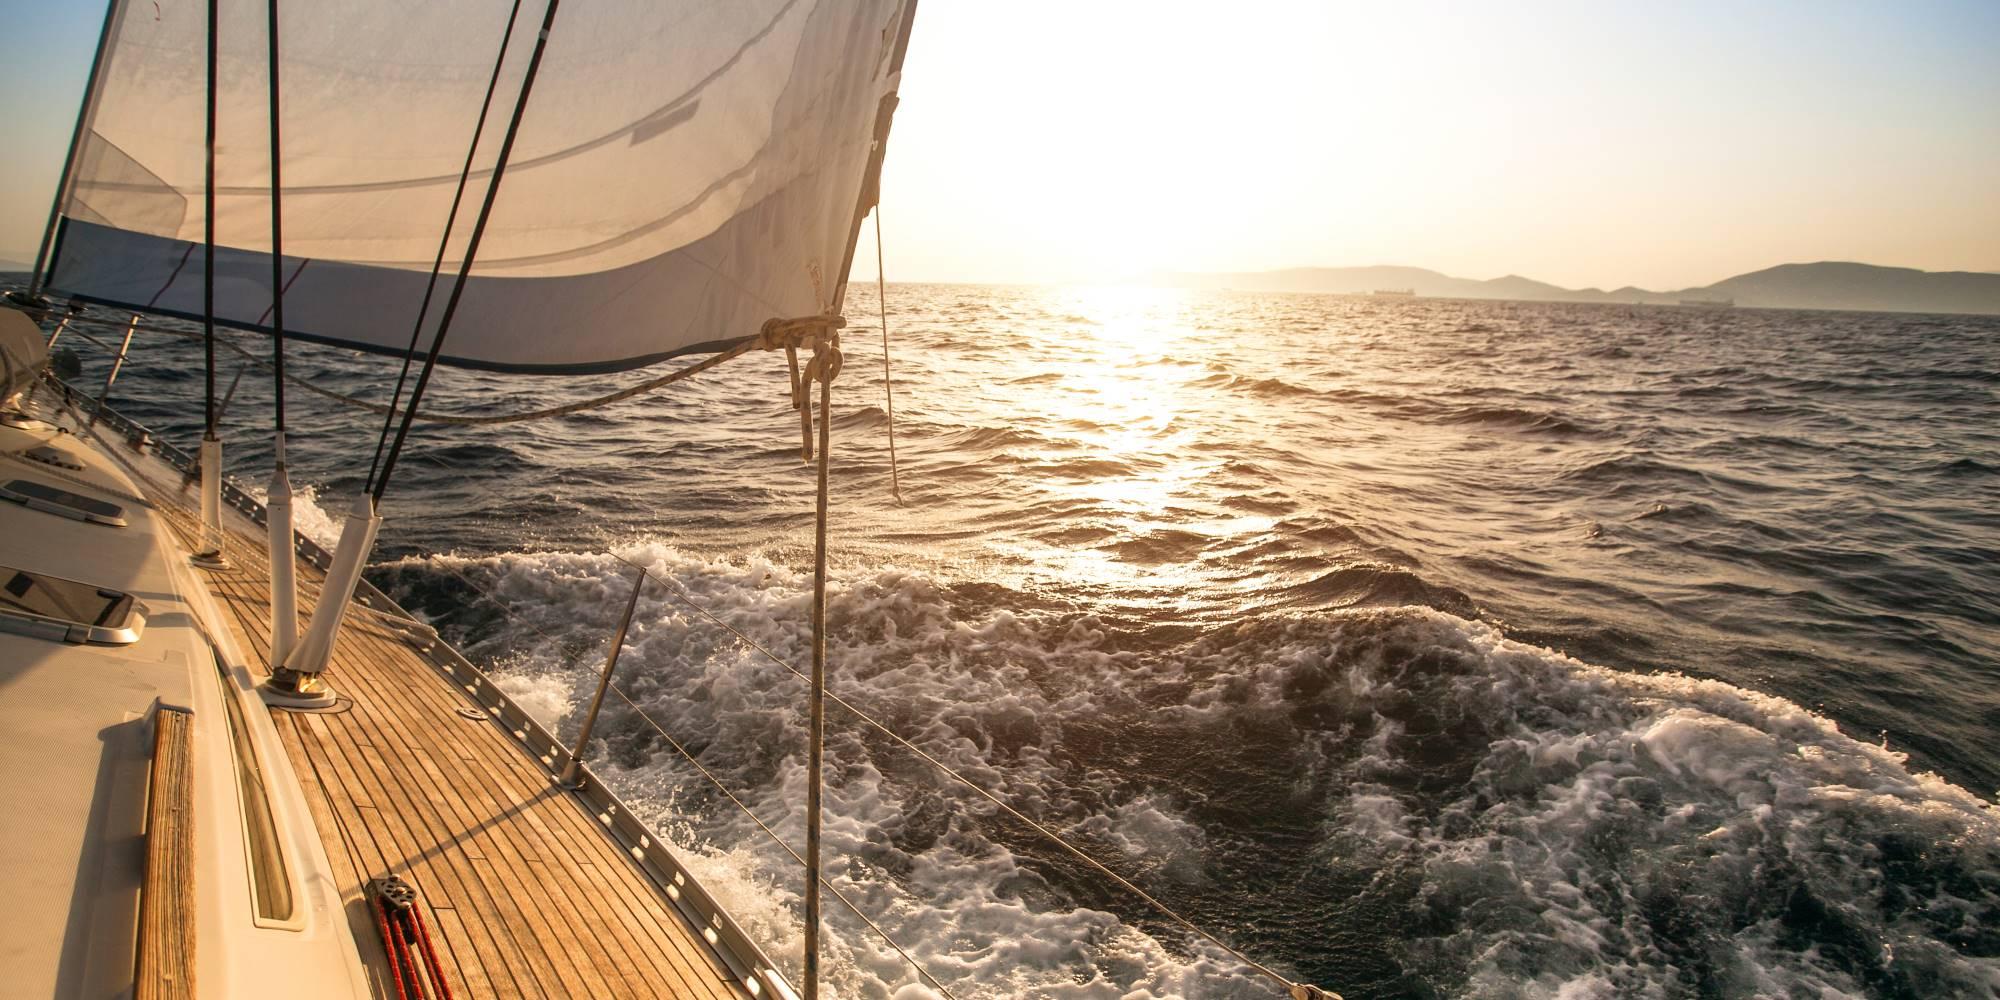 yacht-sailing-towards-the-sunset-35216548